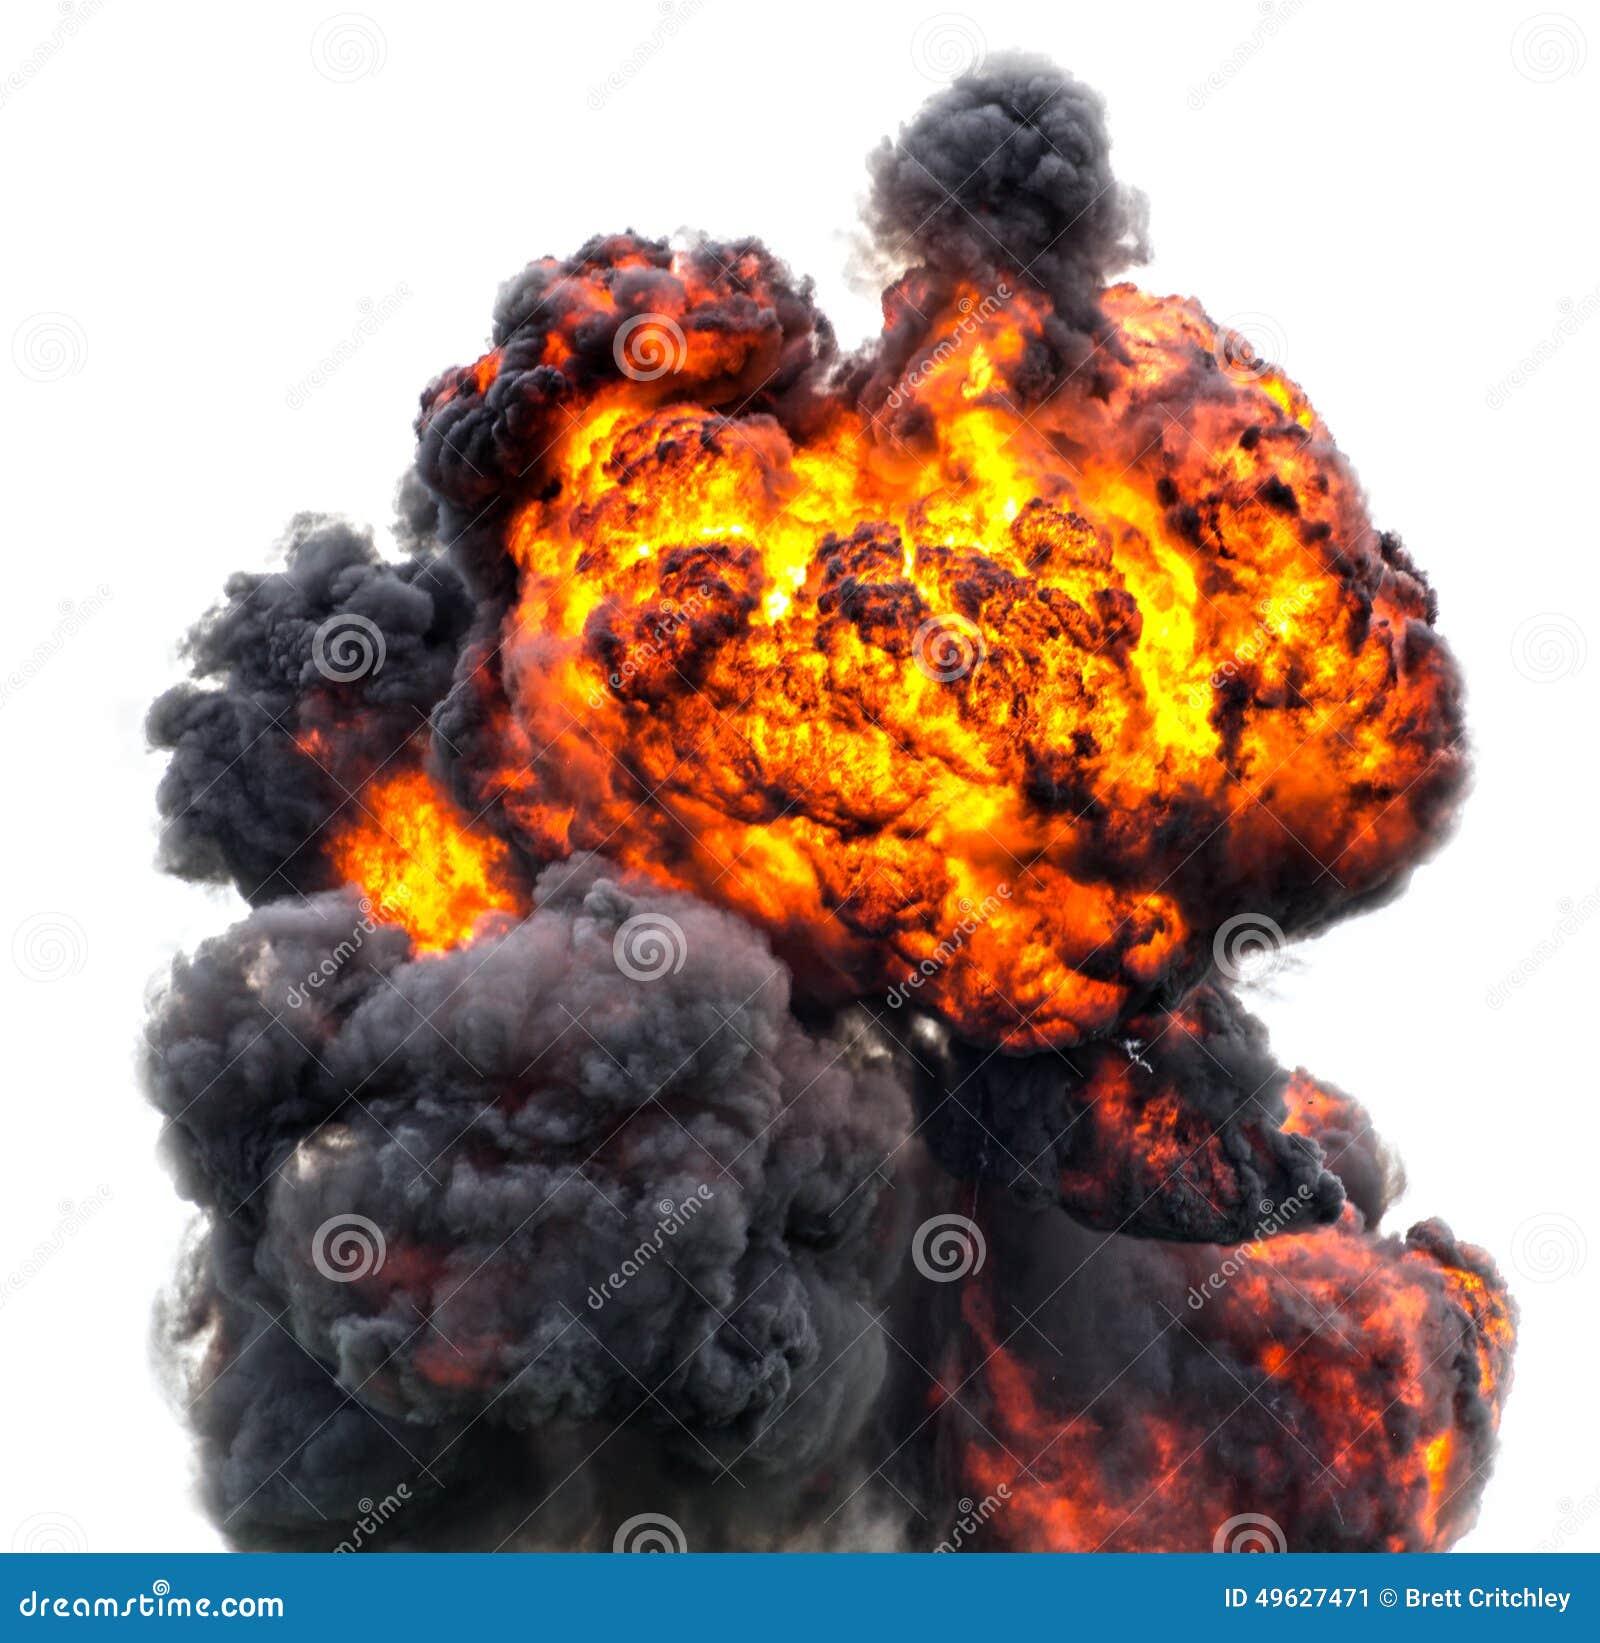 Fireball mushroom cloud inferno